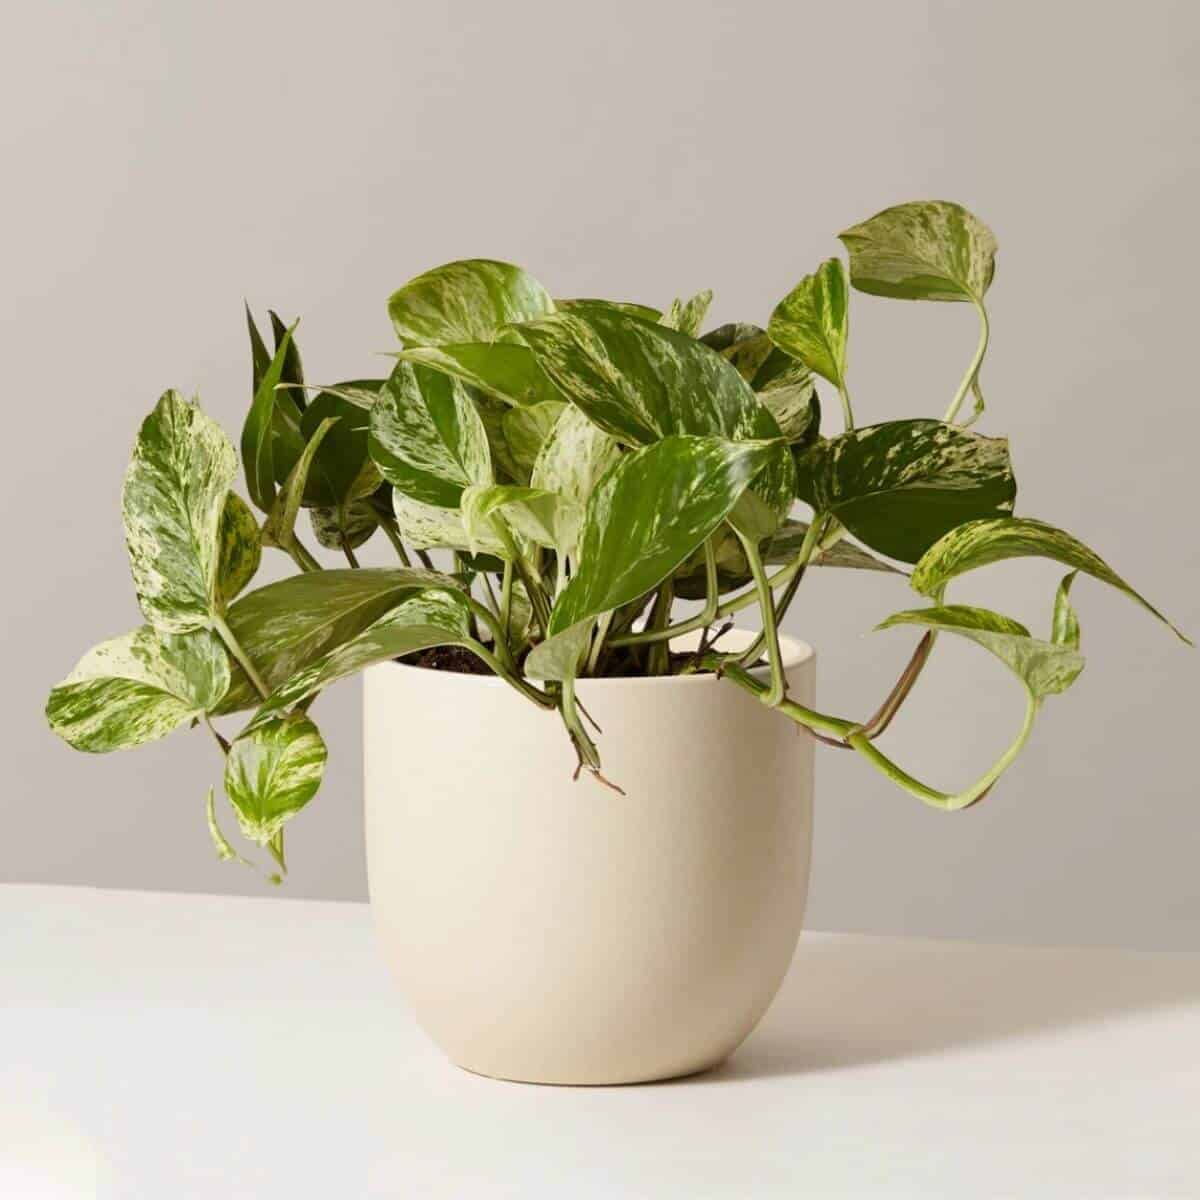 Pothos plant in a beige ceramic planter.